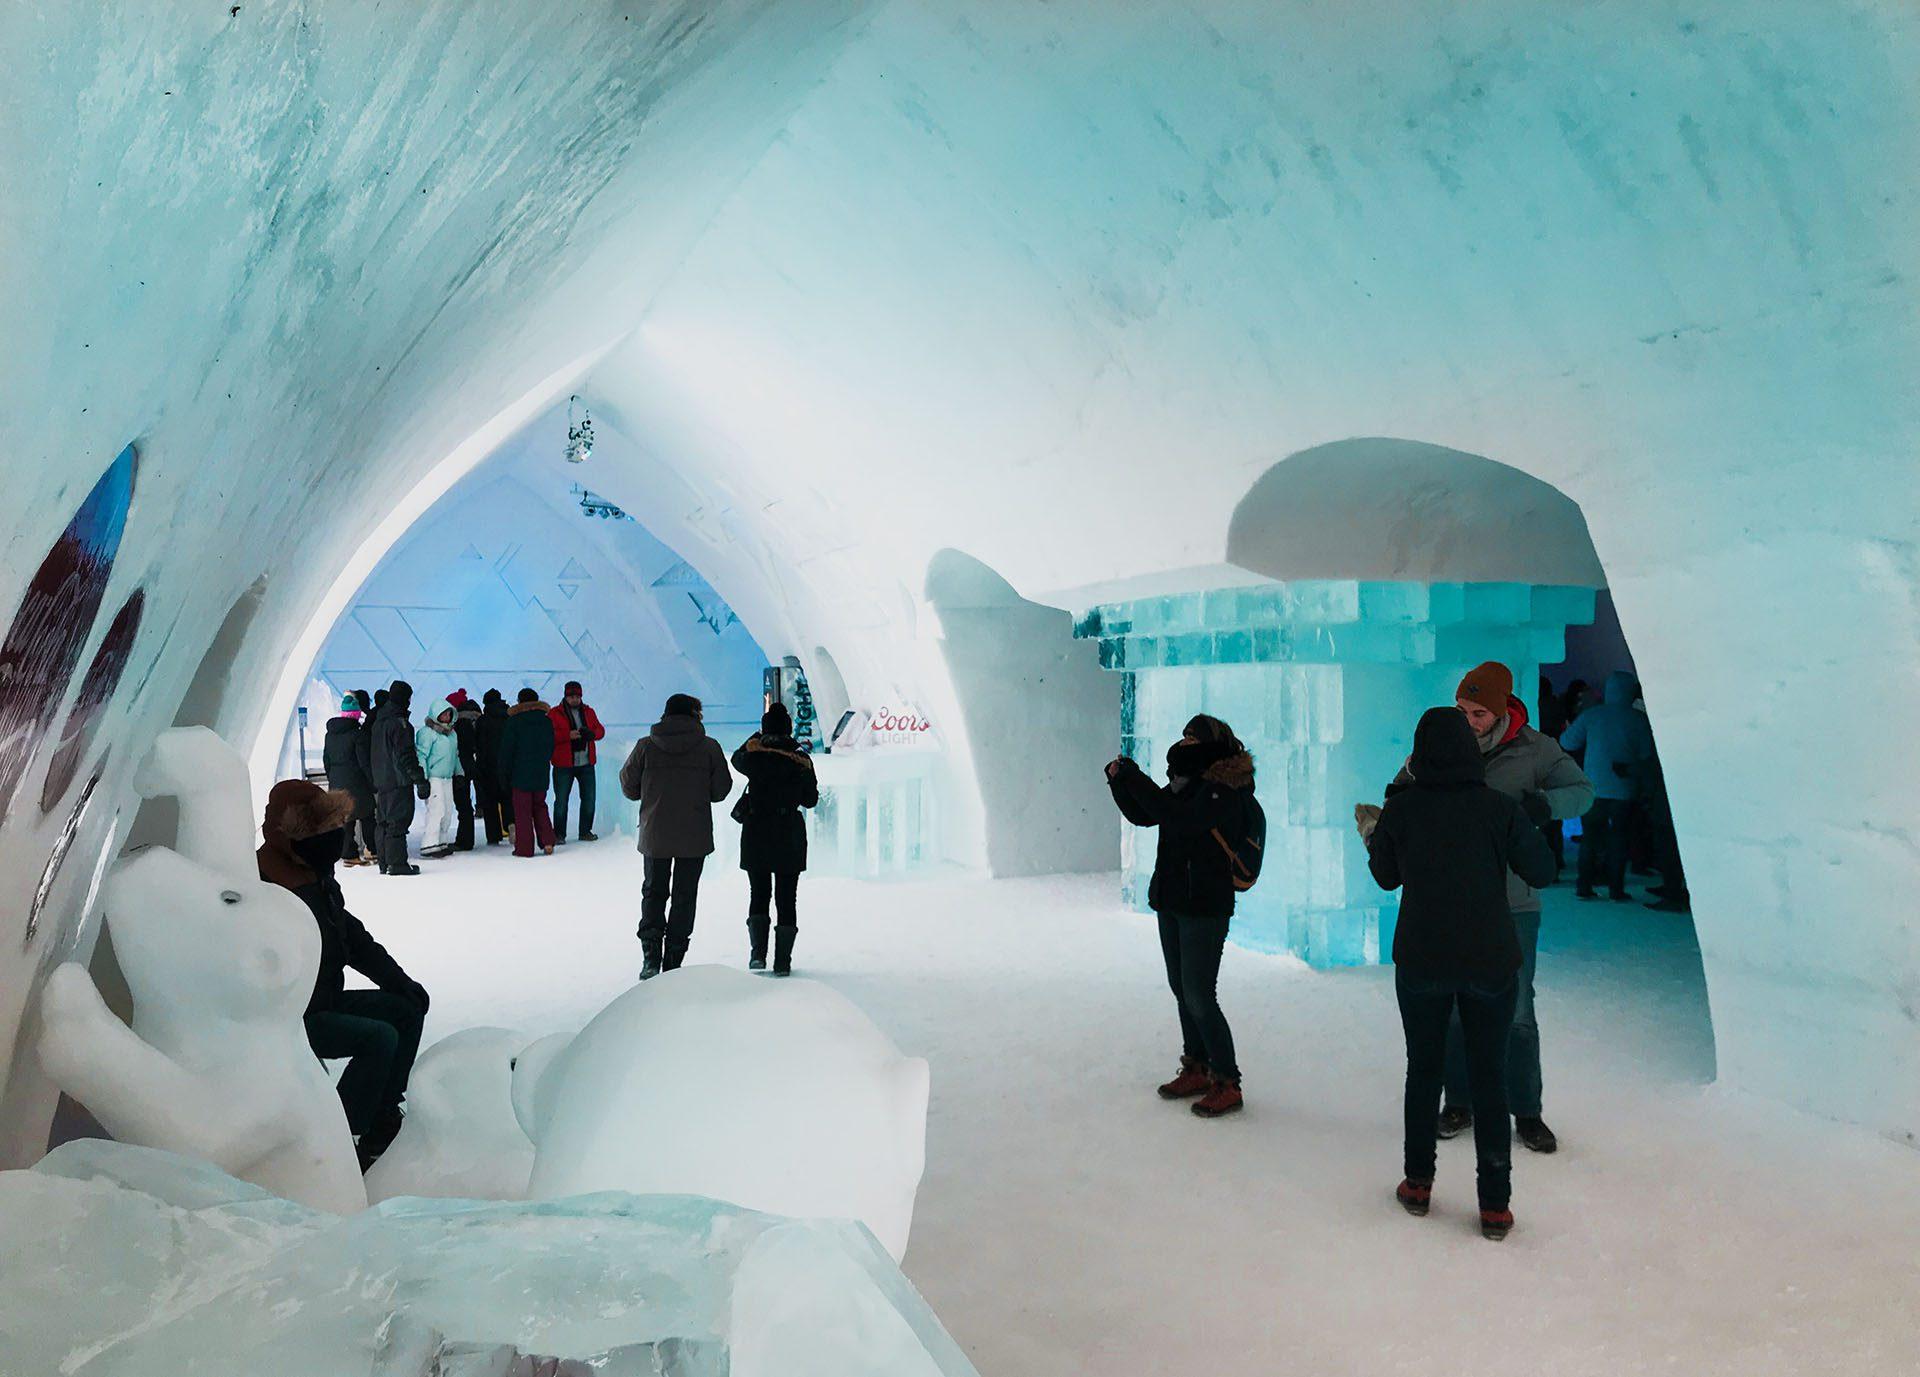 Hôtel gay à Québec : hôtel de glace de la Ville de Québec